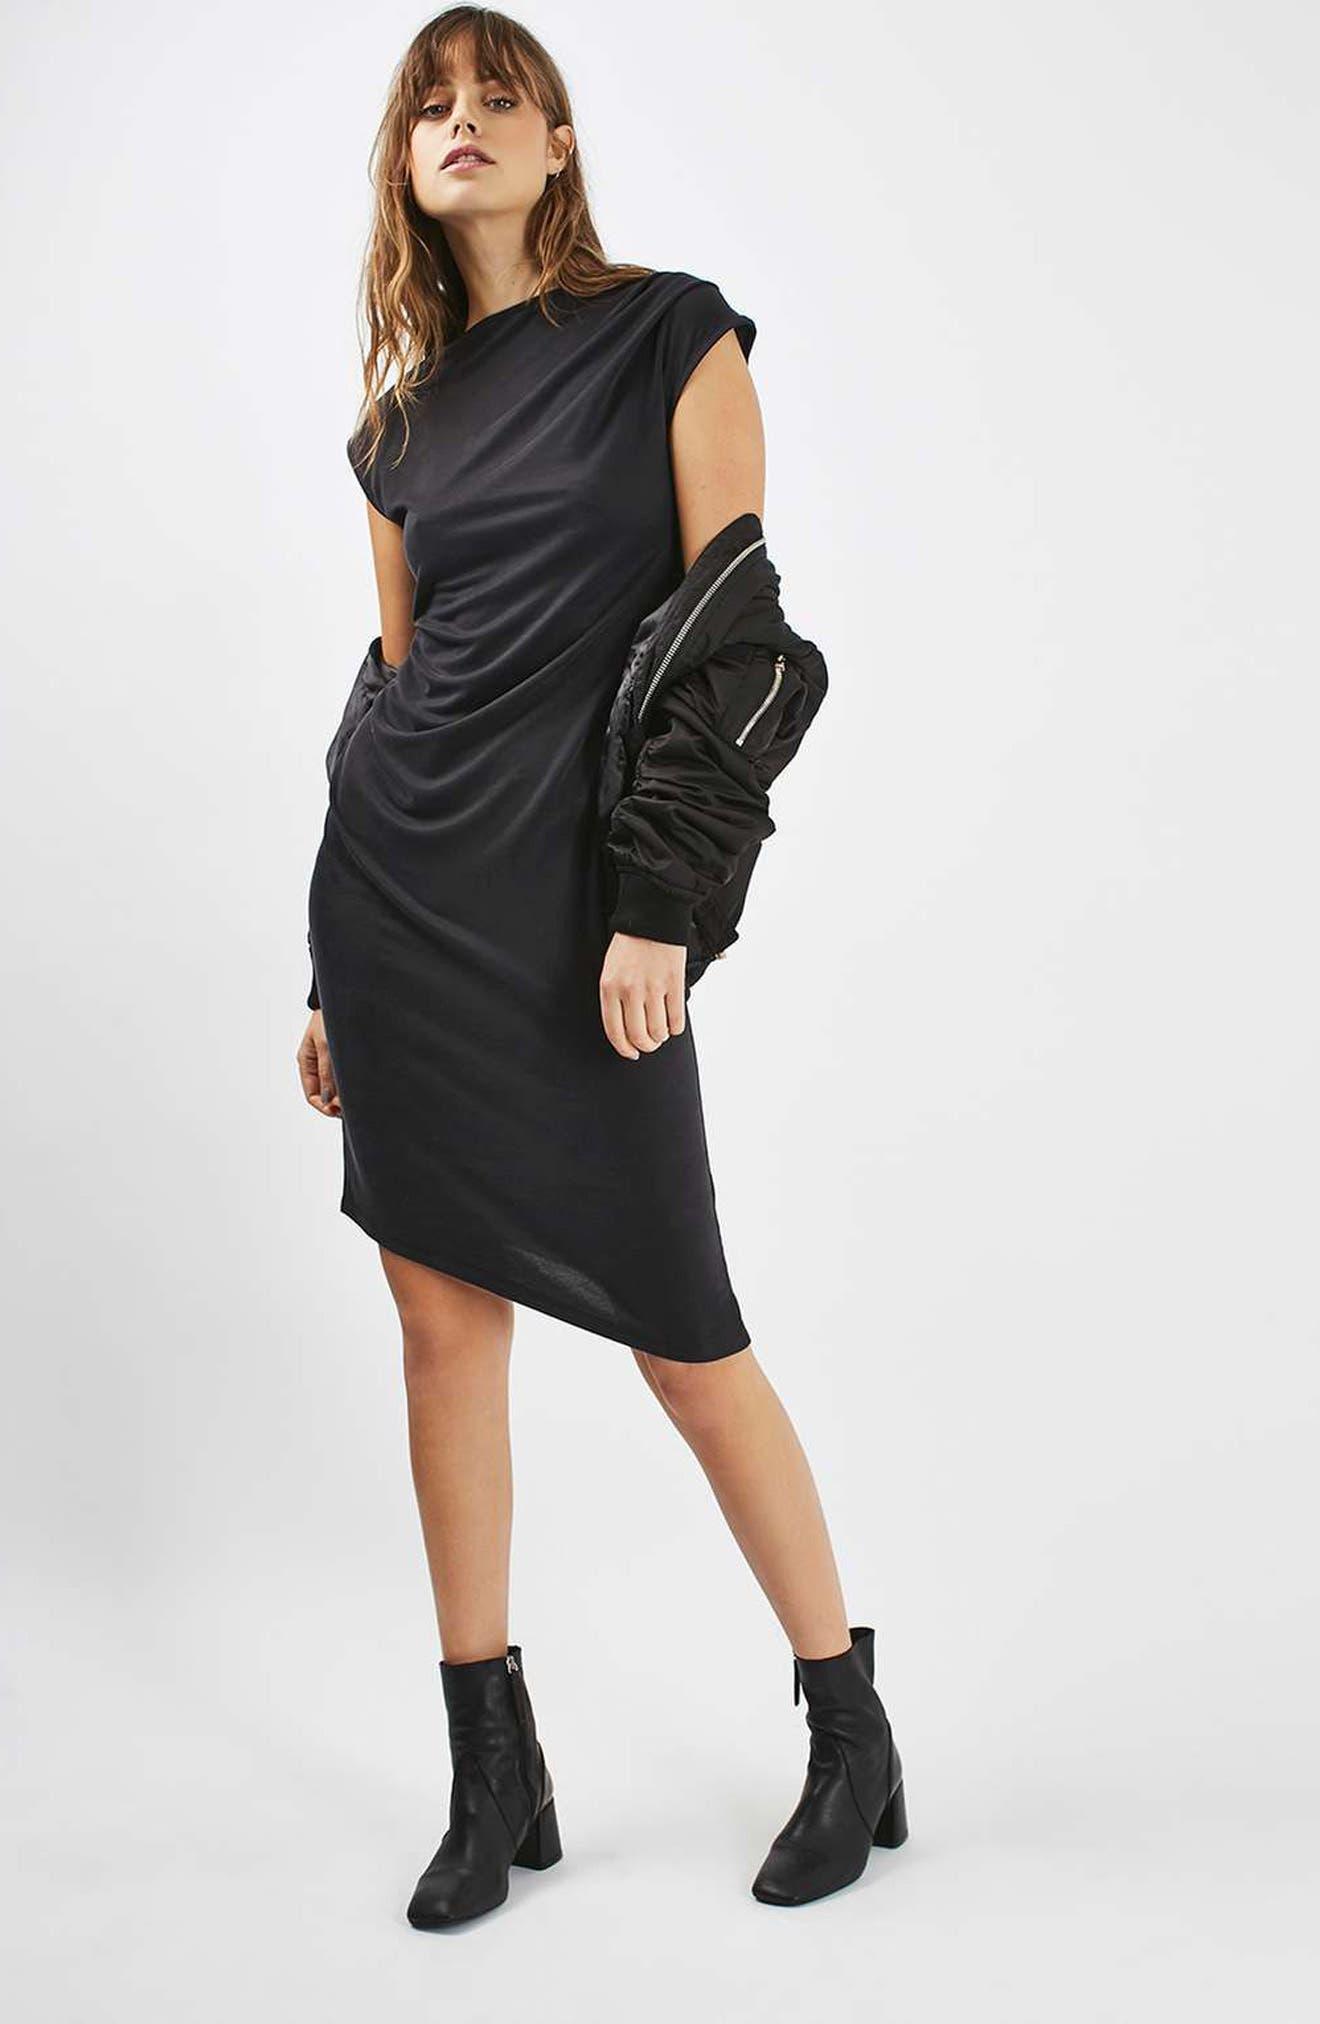 TOPSHOP, Asymmetric Slinky Drape Dress, Alternate thumbnail 2, color, 001